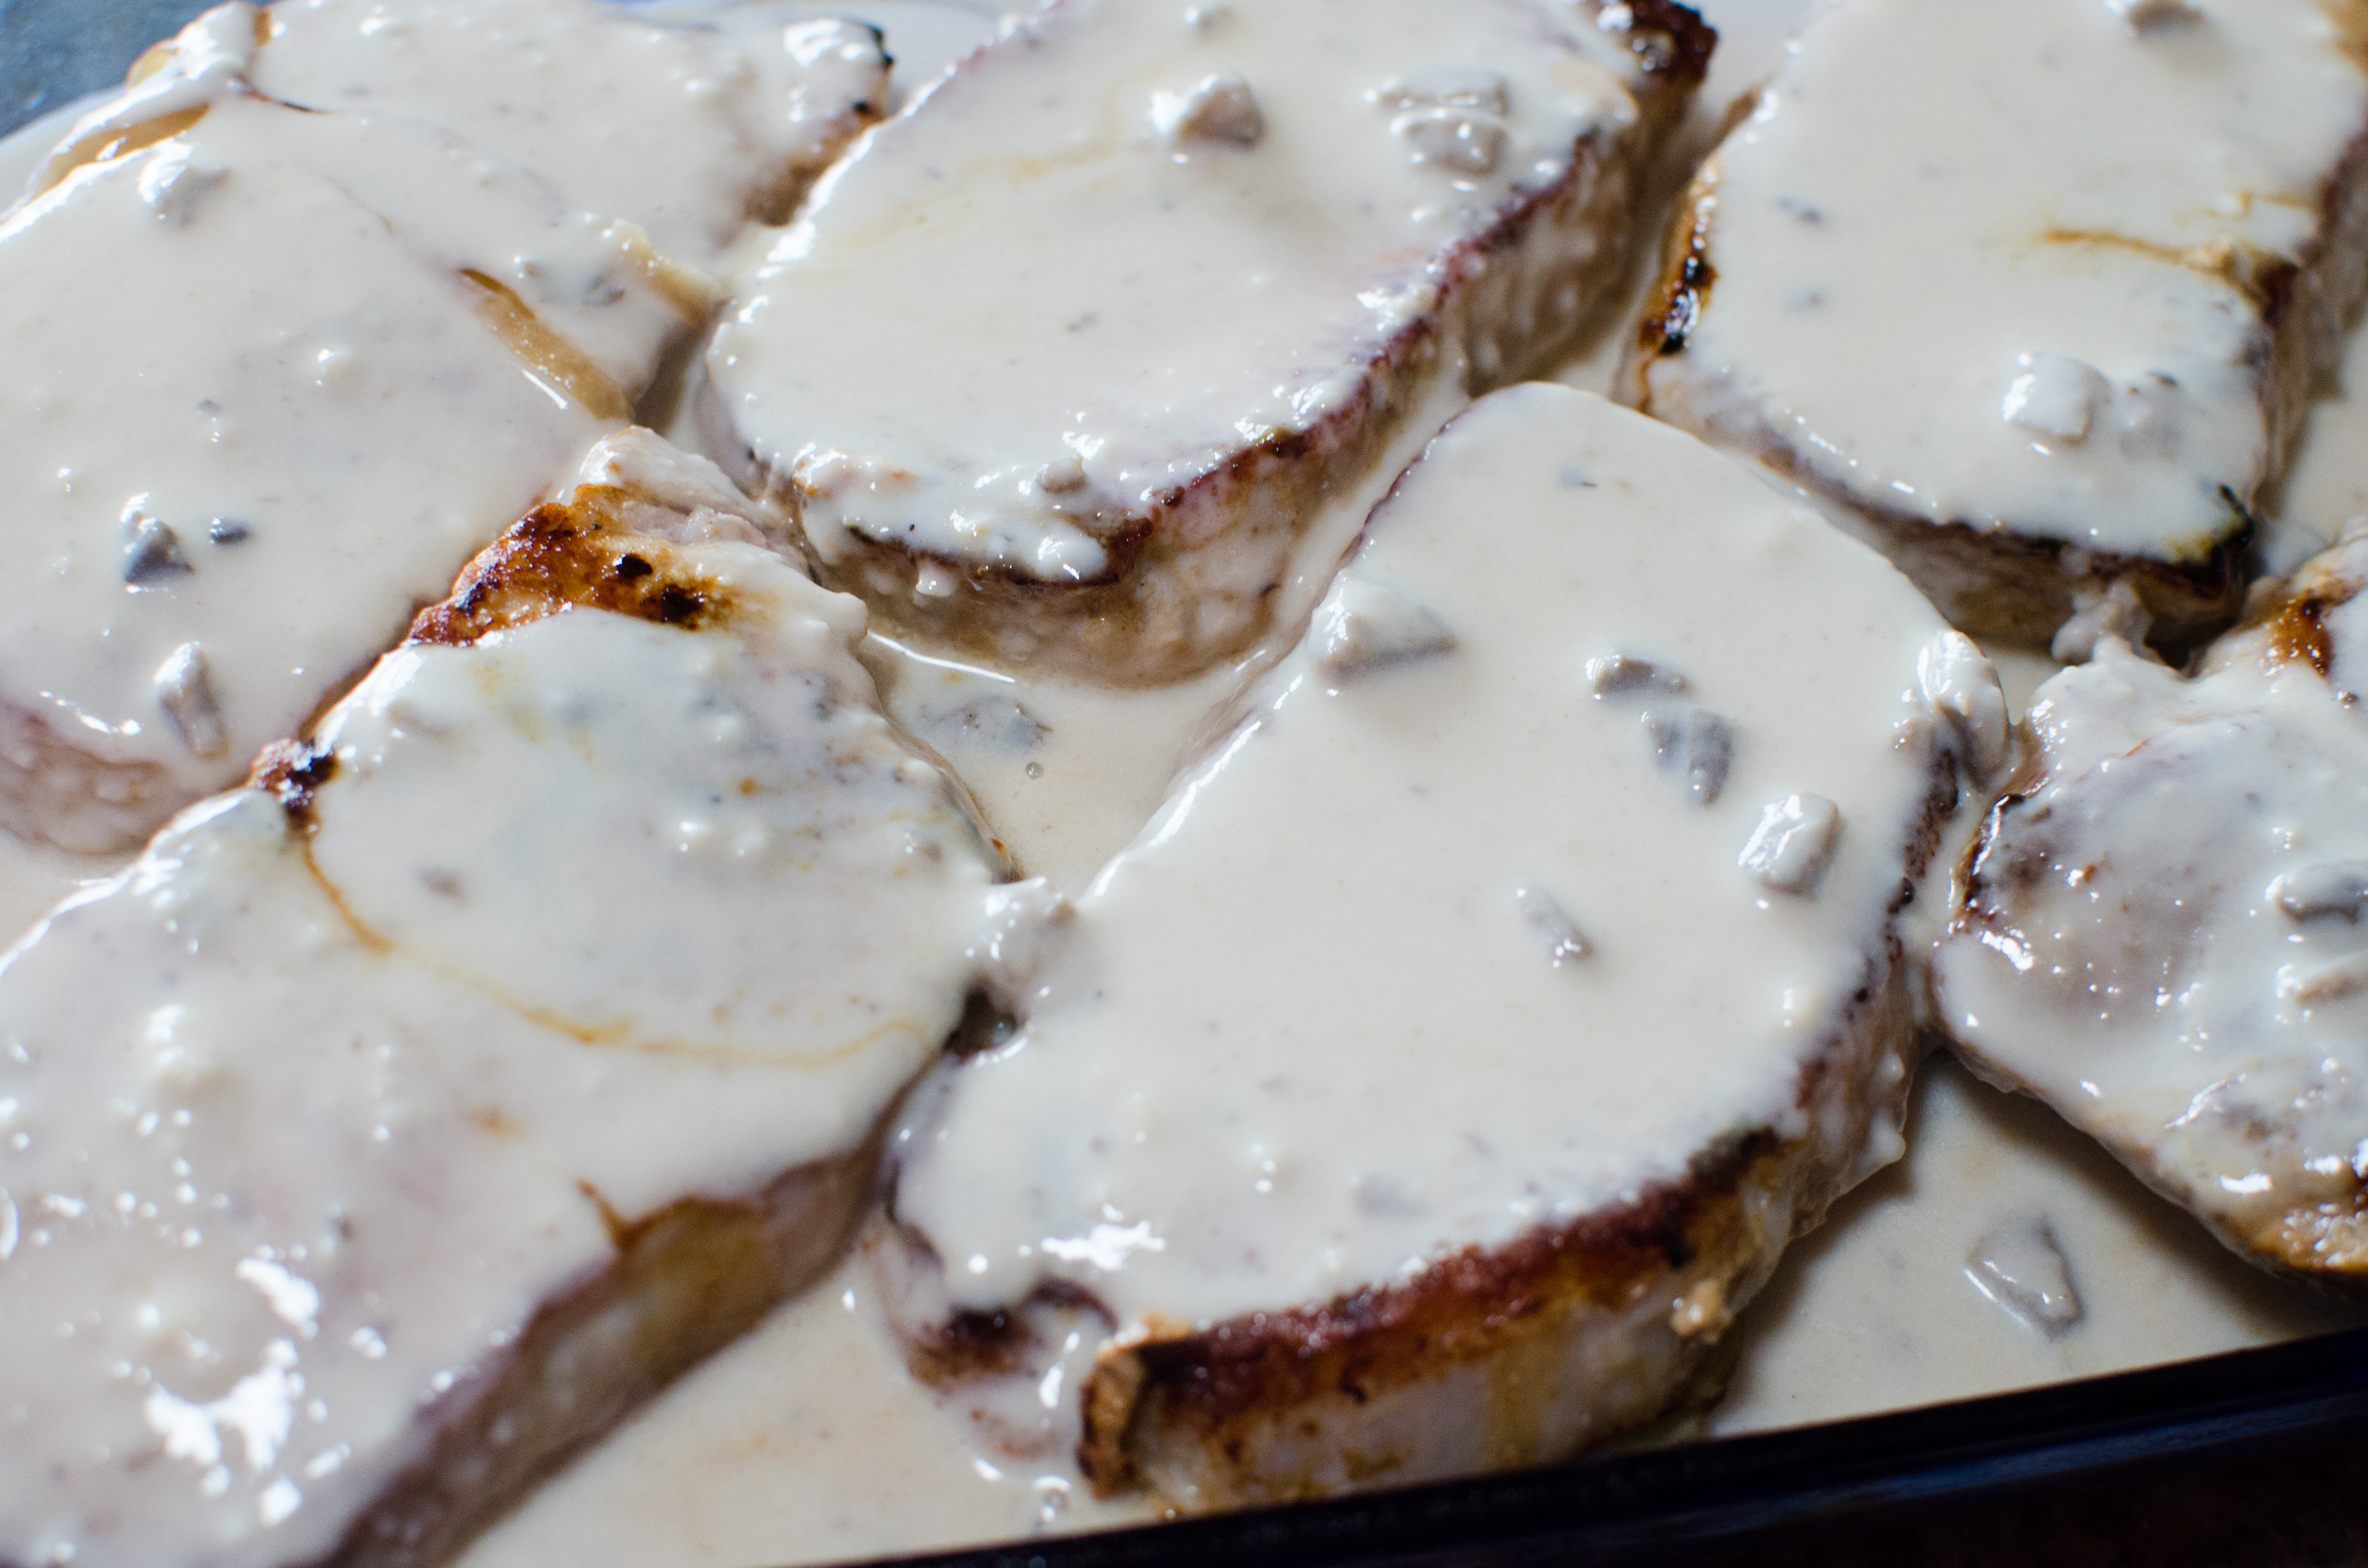 Smothered Pork Chop Scalloped Potato Casserole